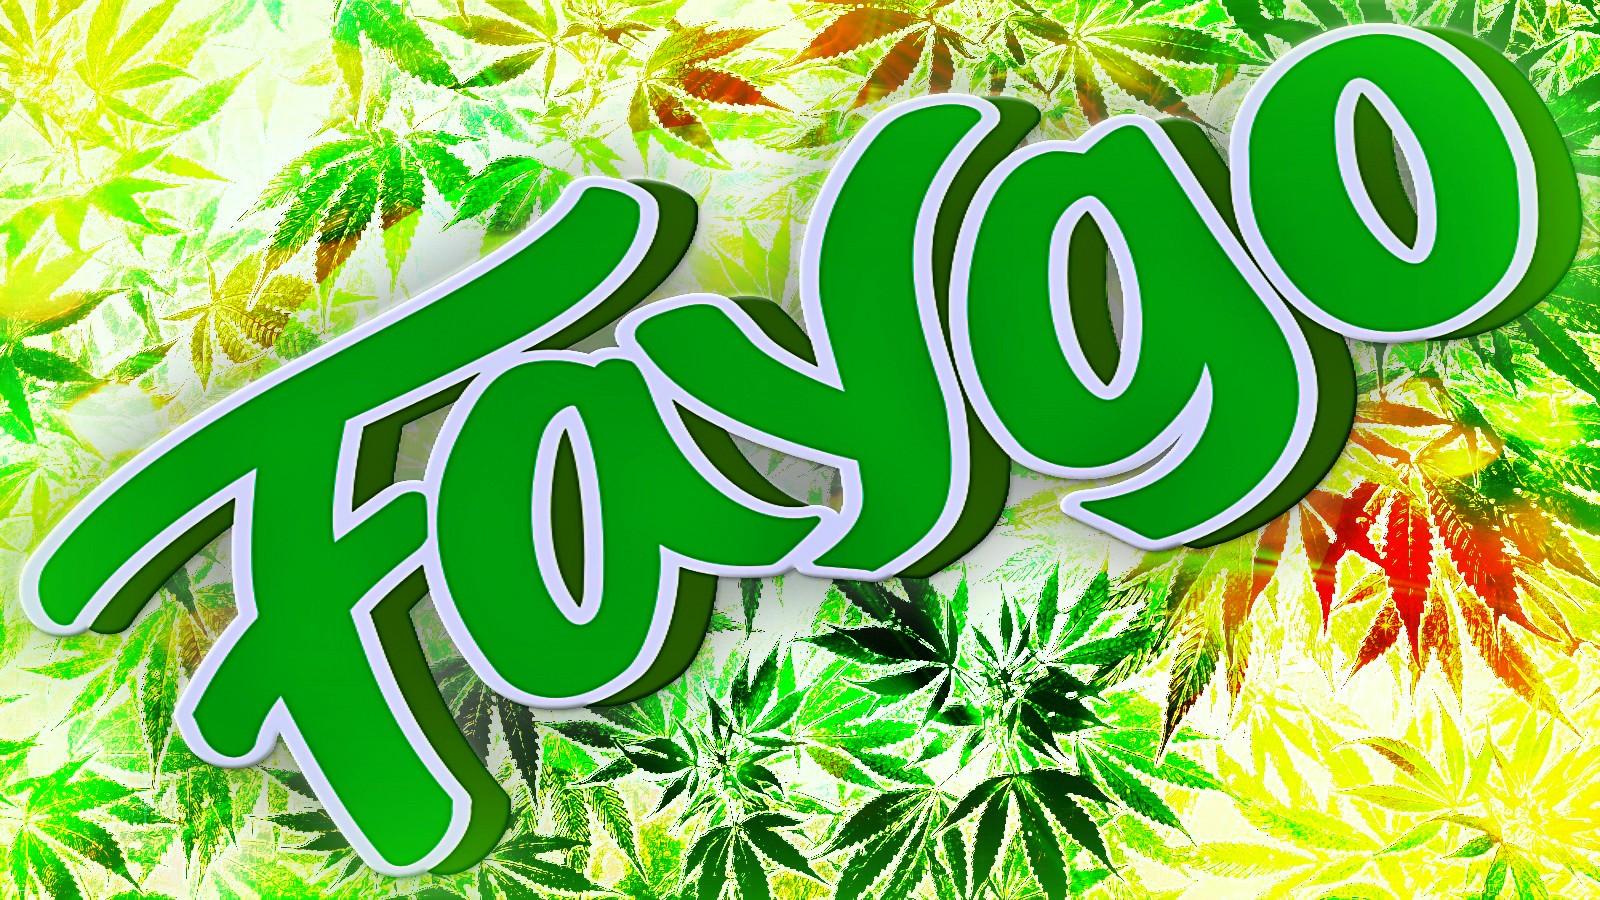 Faygo Juggalo Cannabis Green Yellow